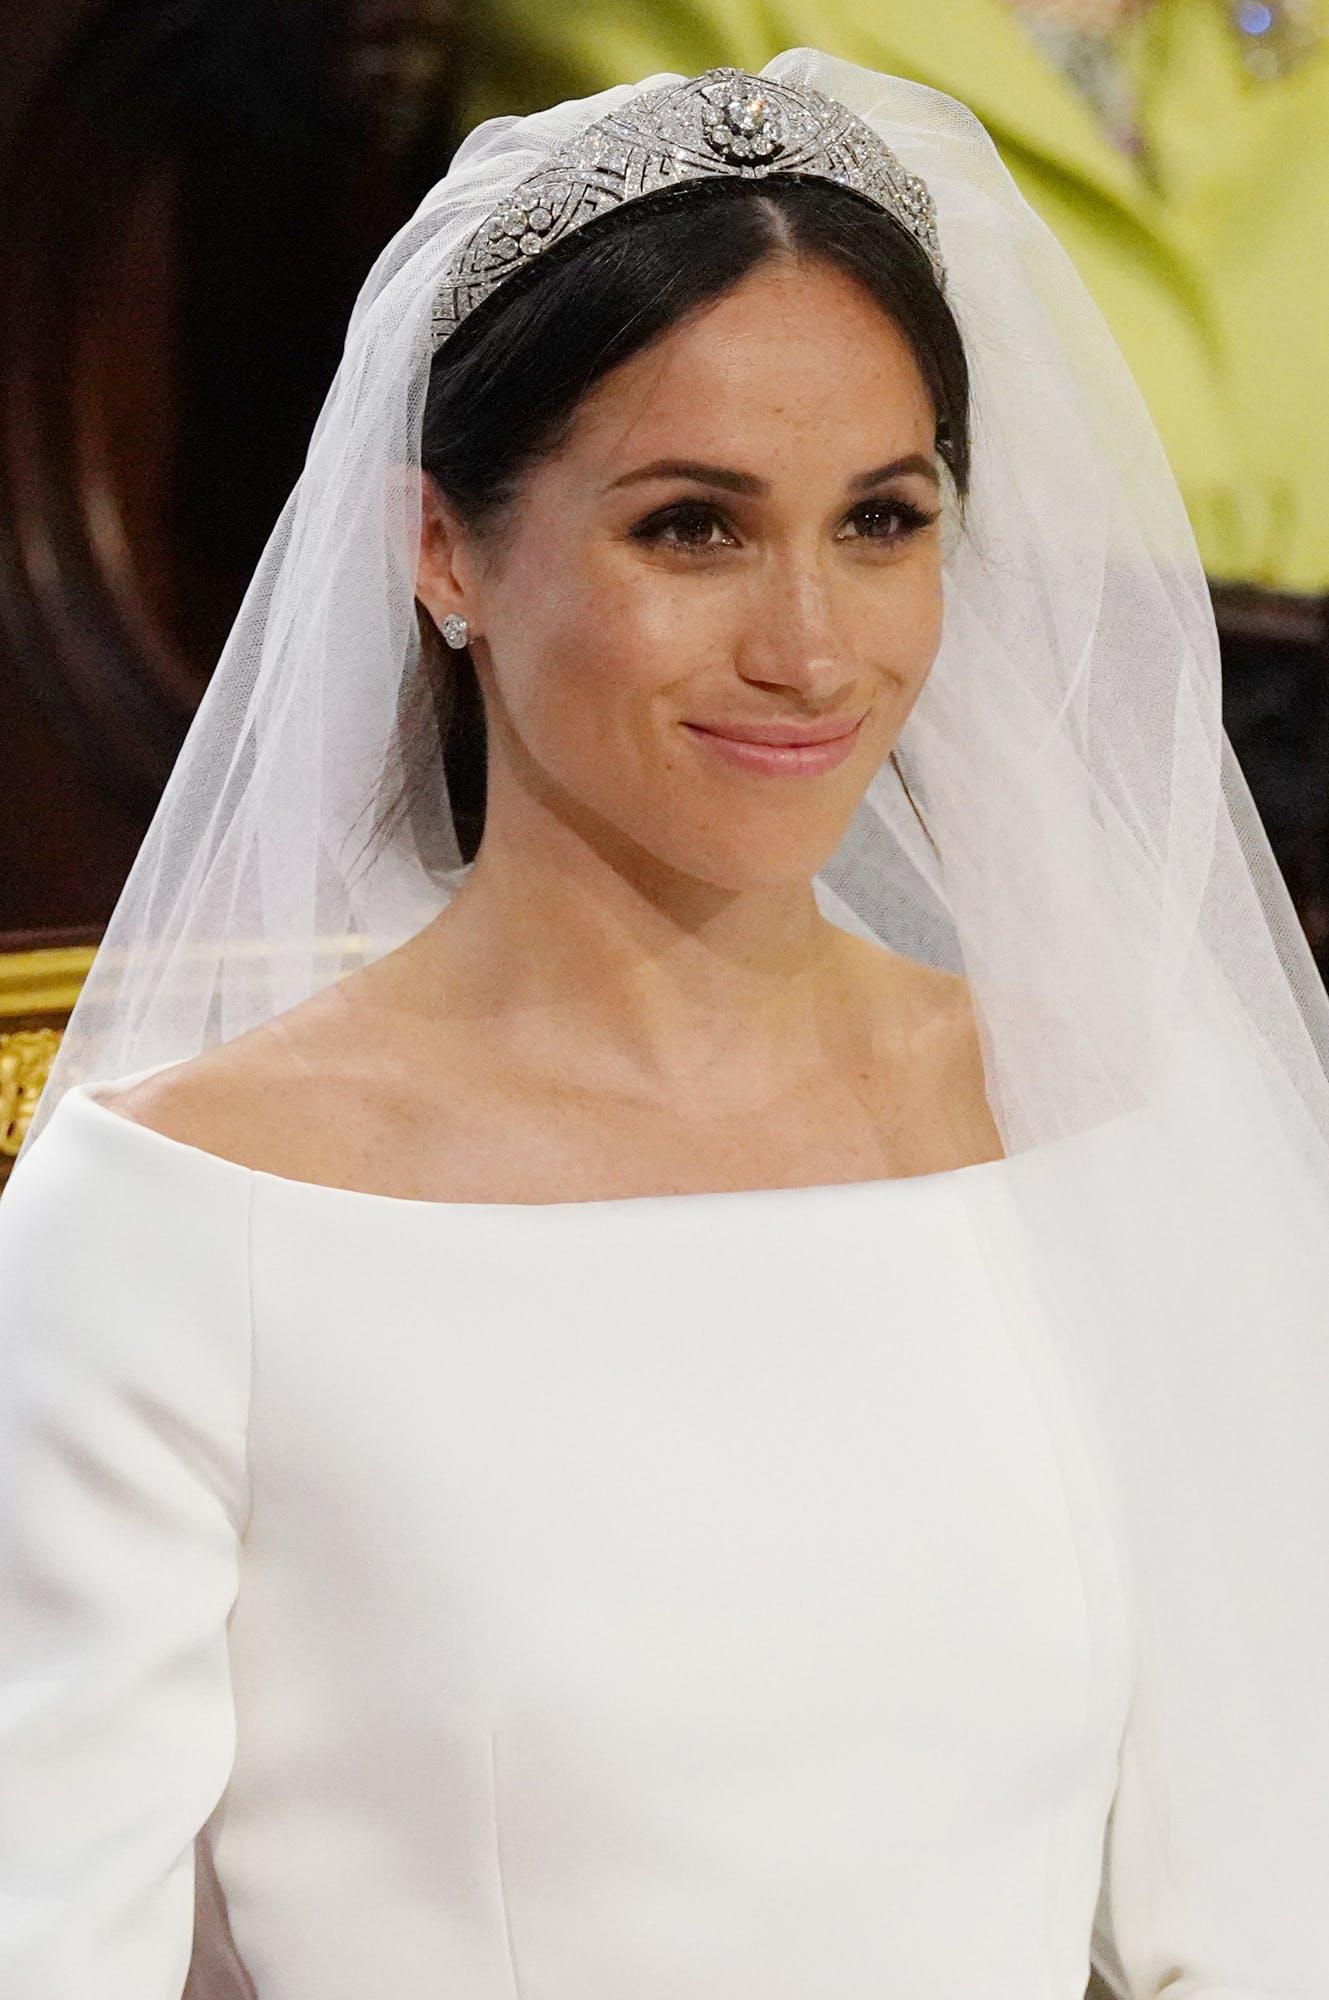 meghan markle Queen Mary Diamond Bandeau tiara wedding day